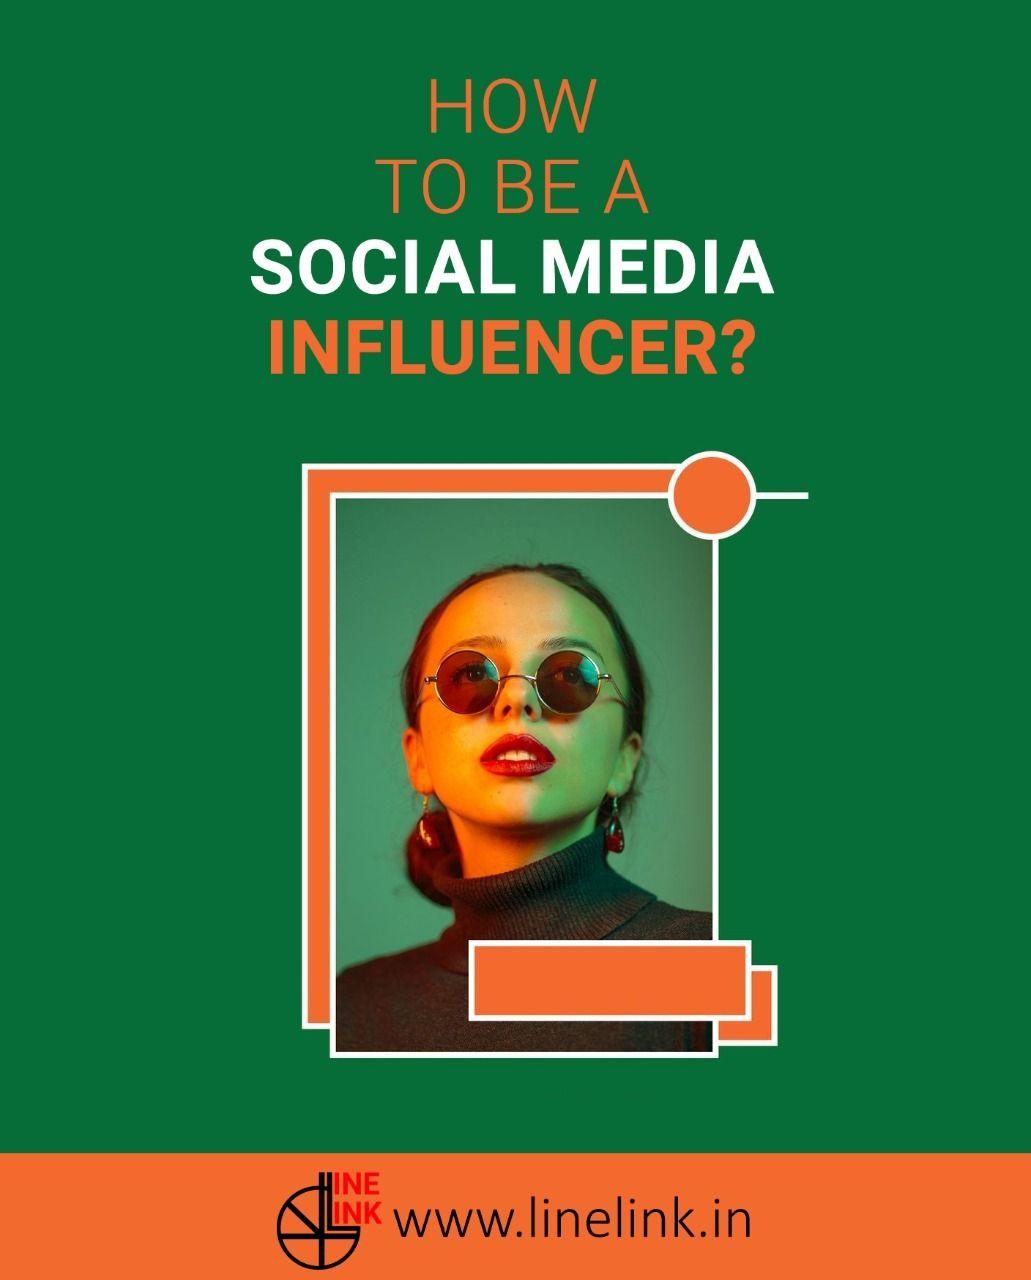 Digital influencer business freedom freedom life